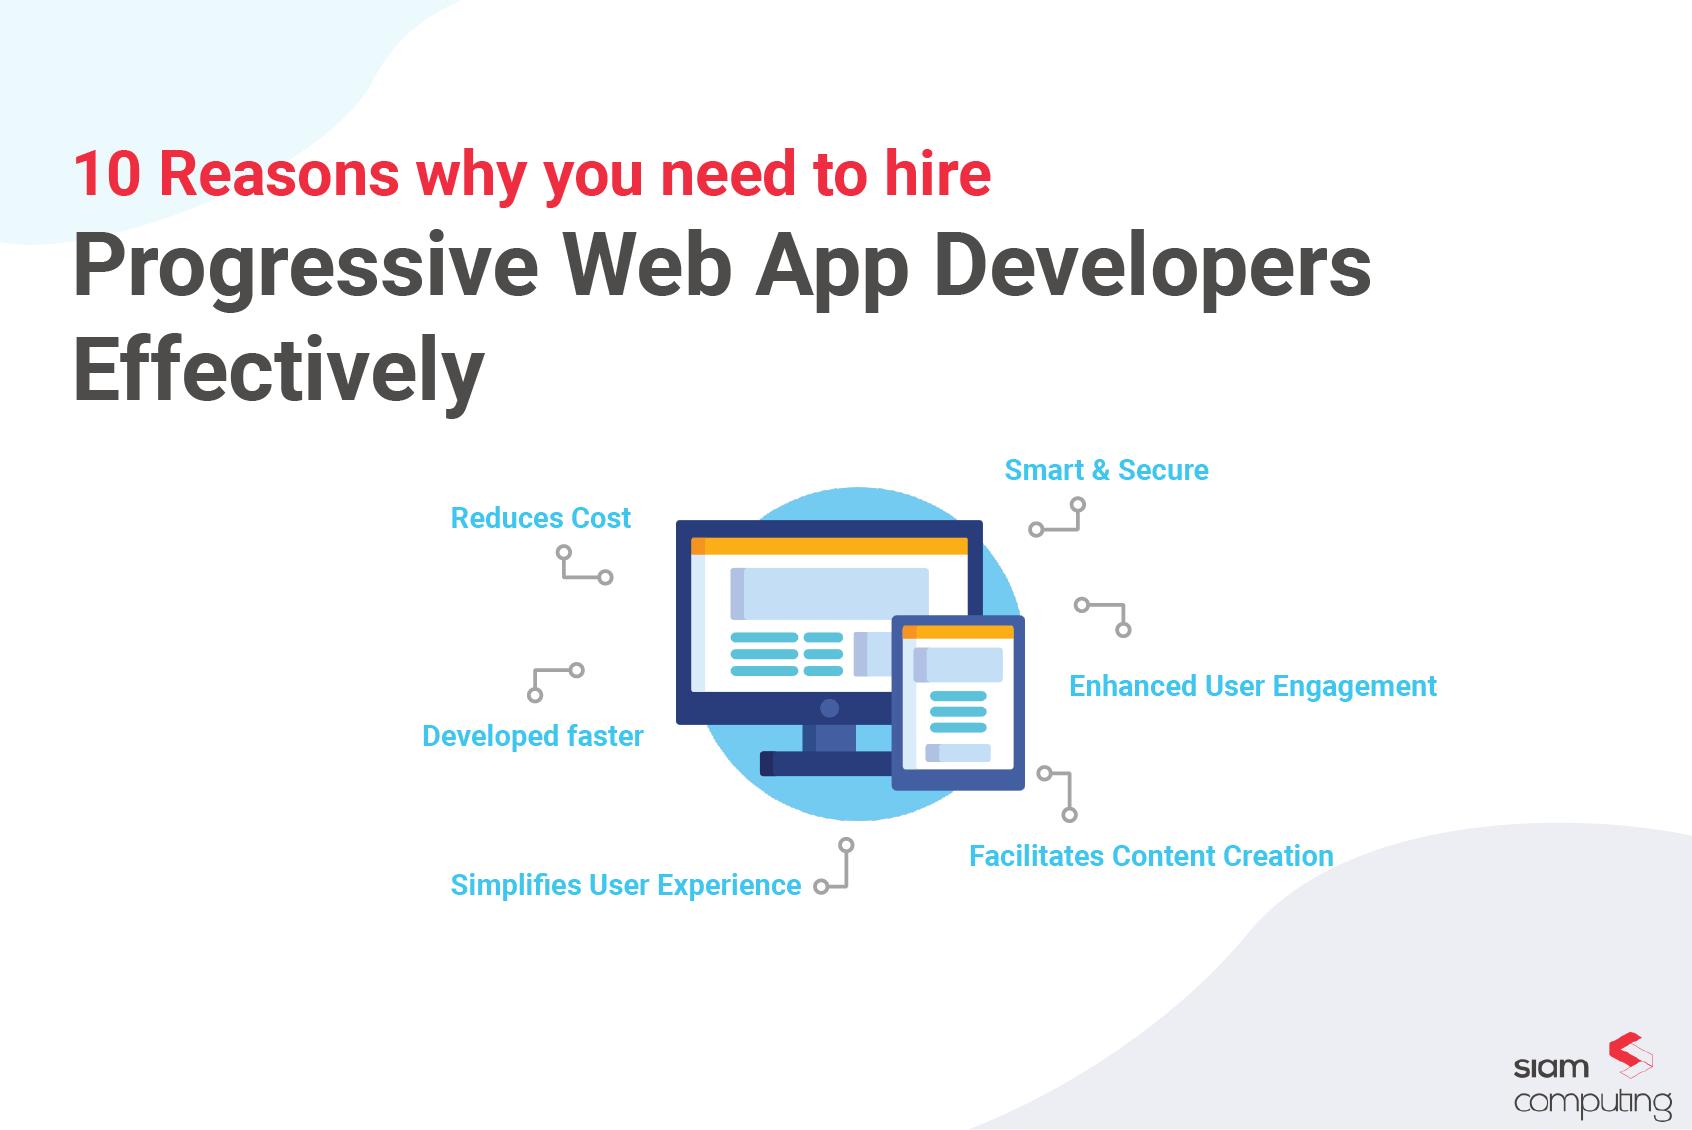 Progressive web app developers